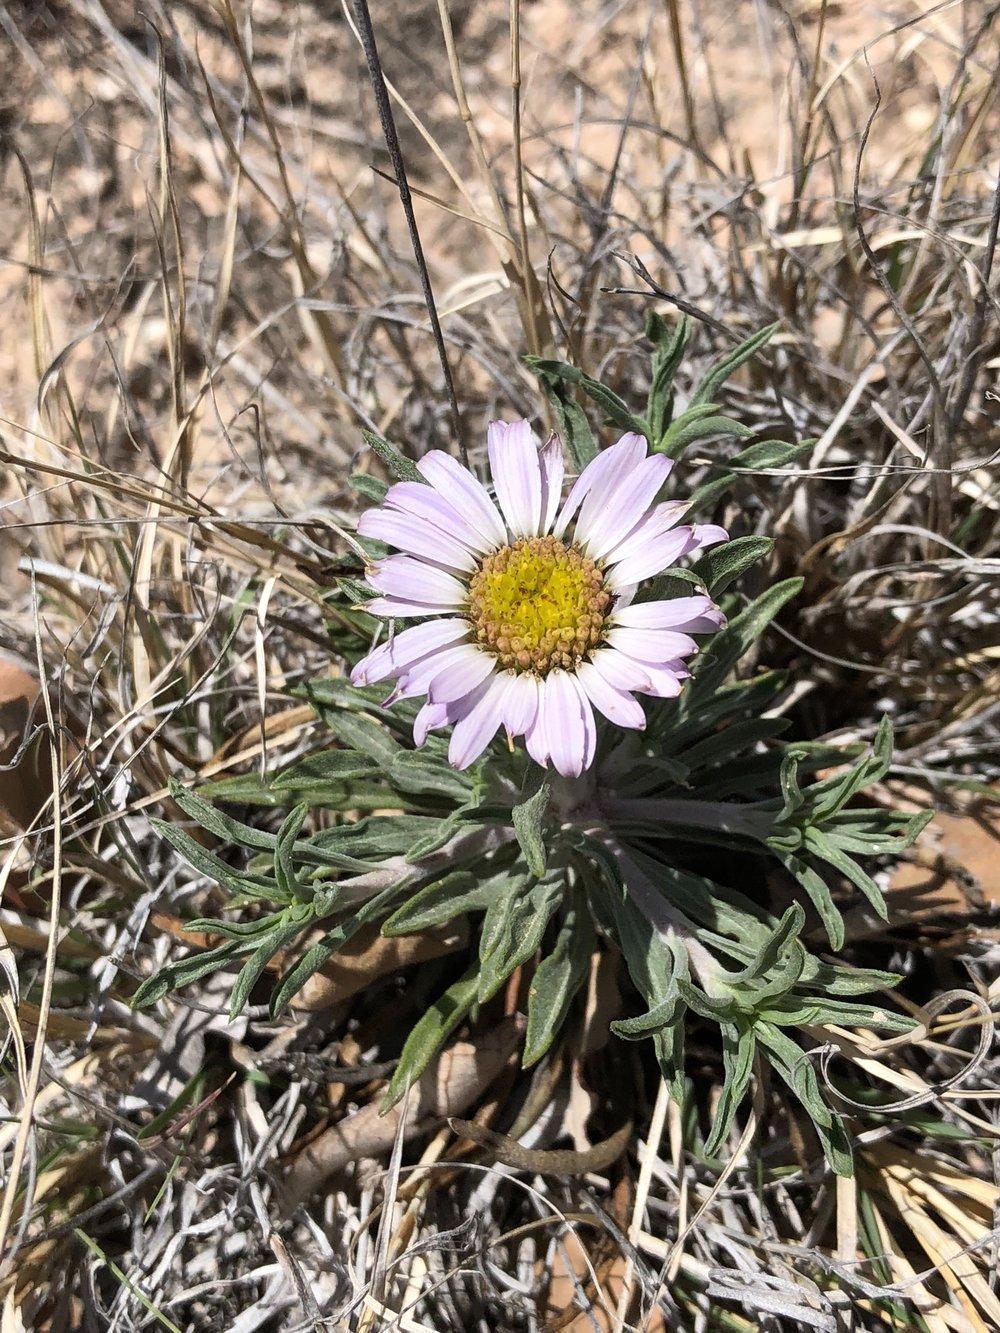 Townsendia texensis, Texas Townsend Daisy